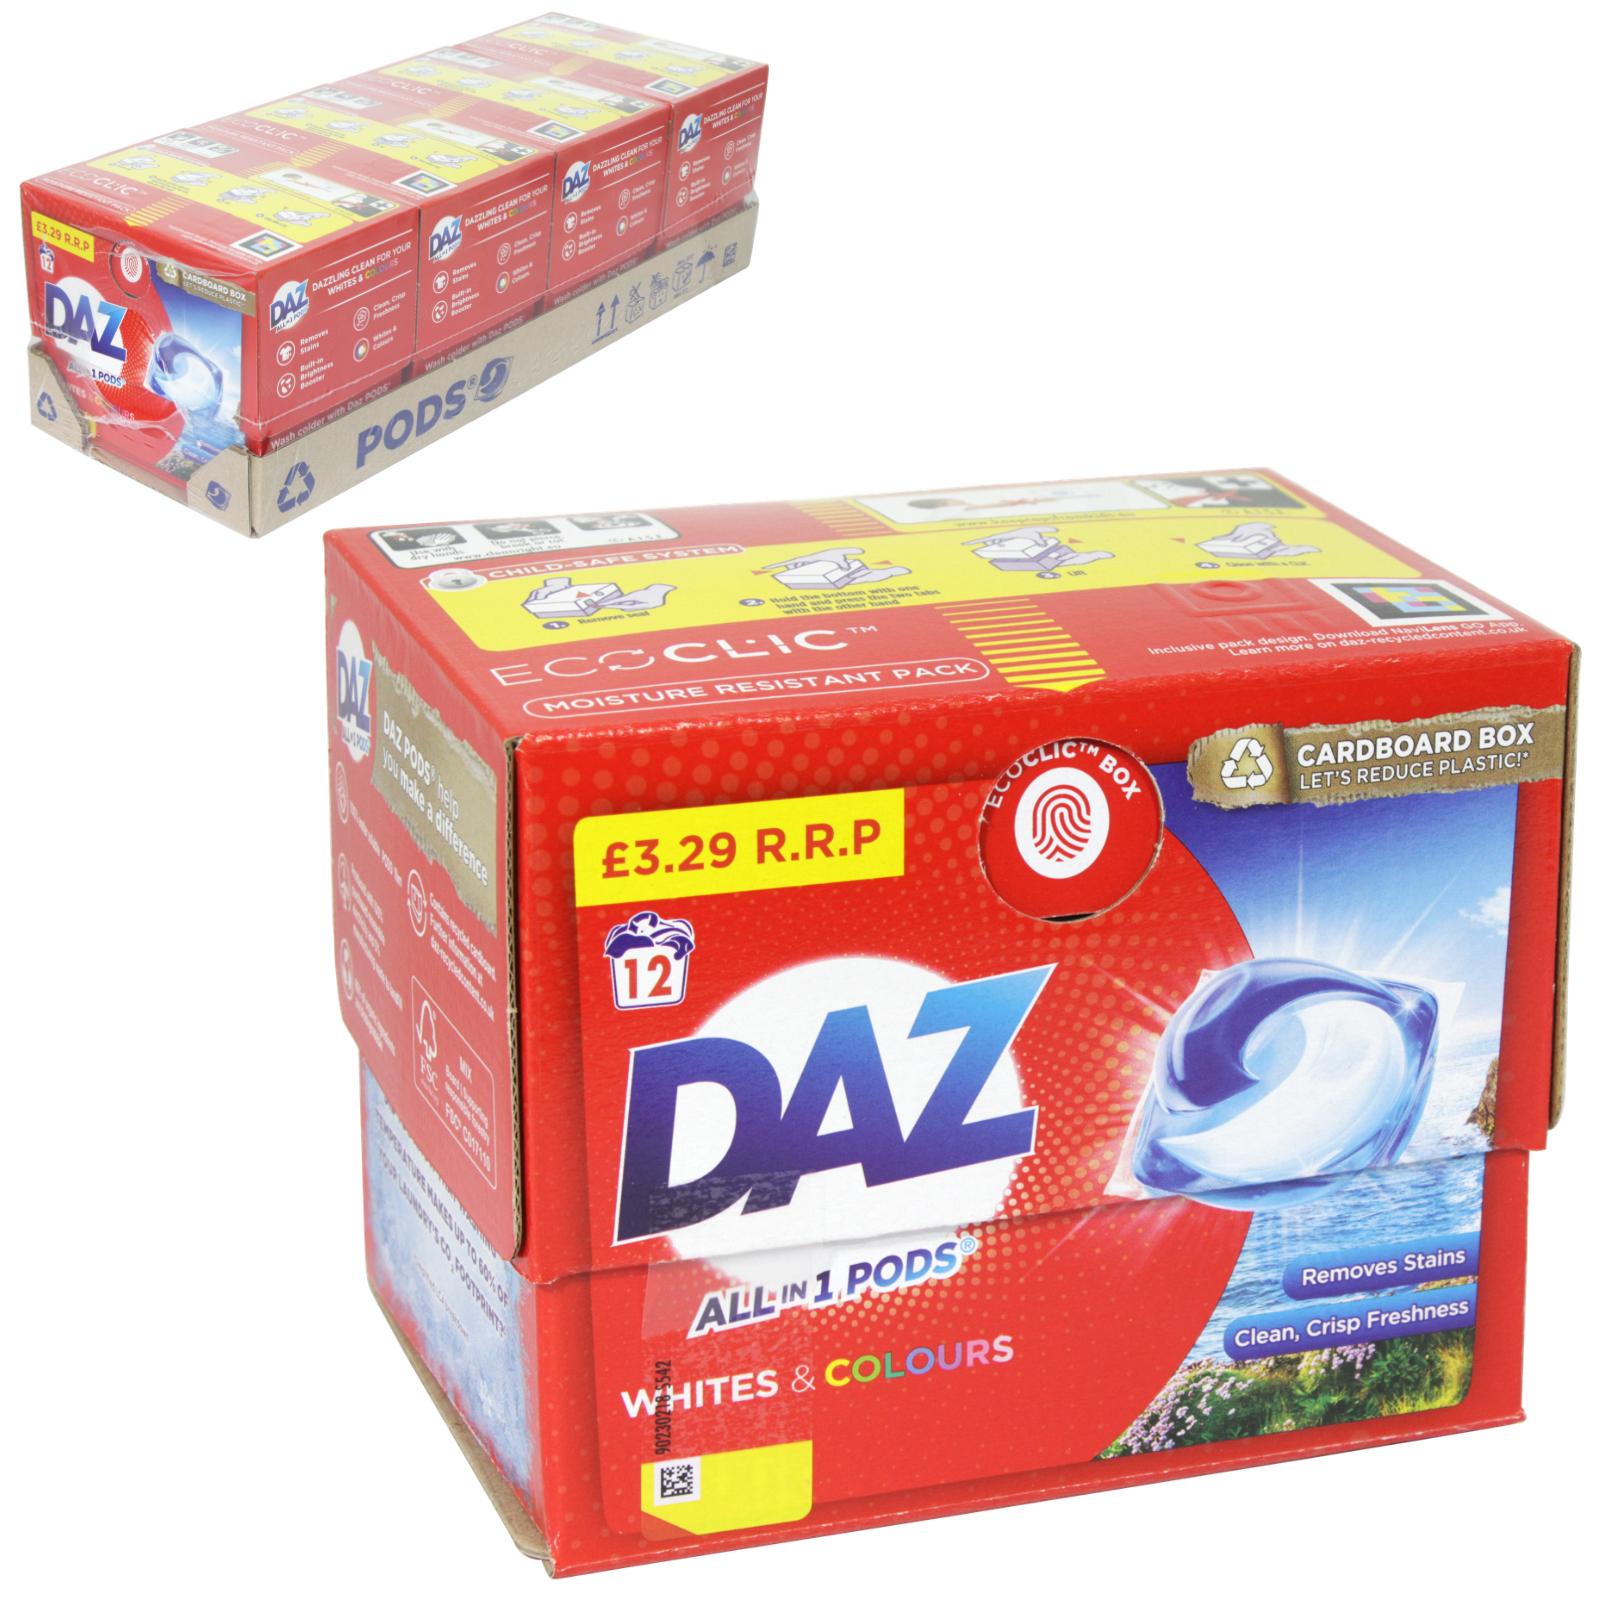 DAZ GO PODS 12 WASH PM